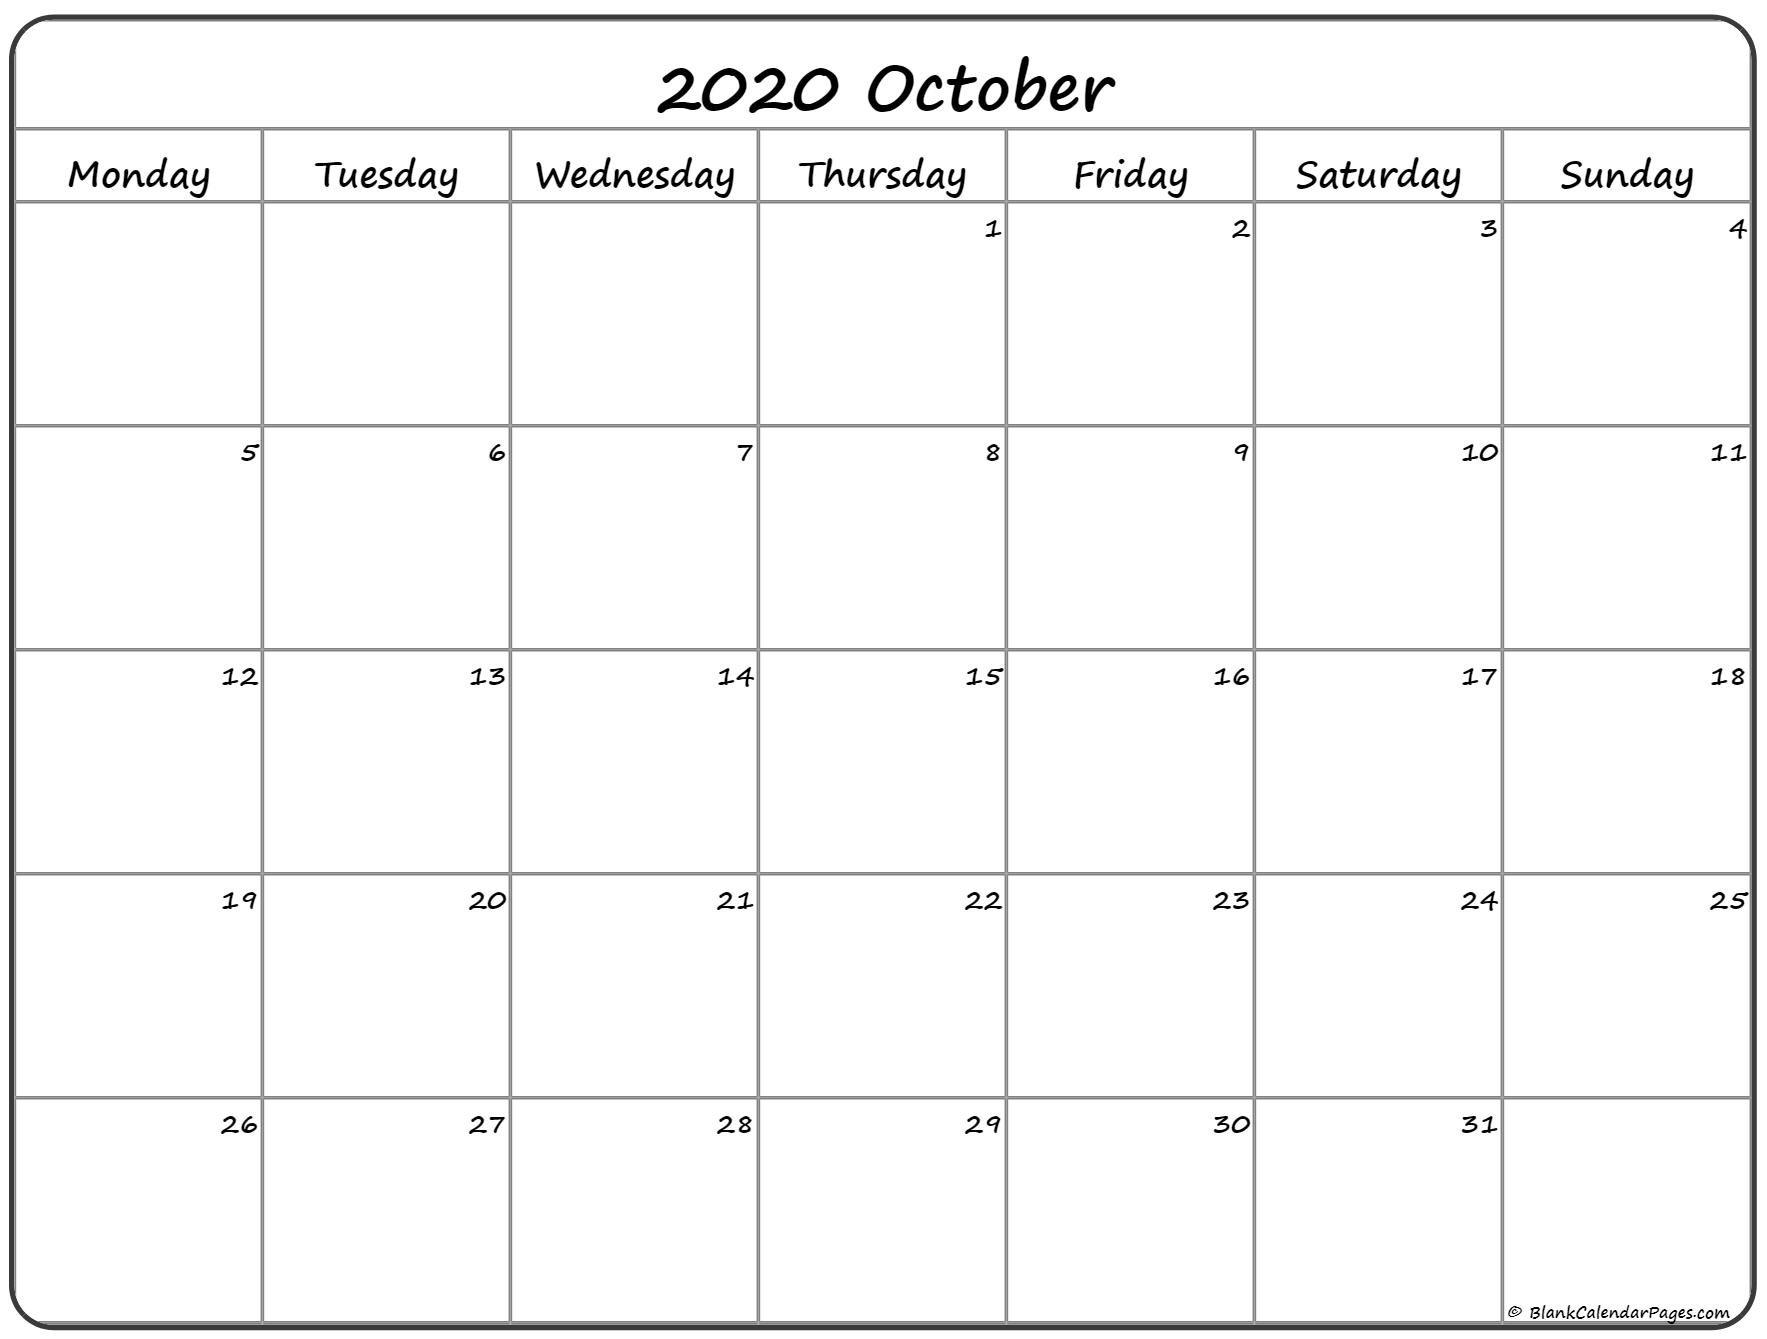 October 2020 Monday Calendar | Monday To Sunday Free Printable Monday Thru Sunday Calendars